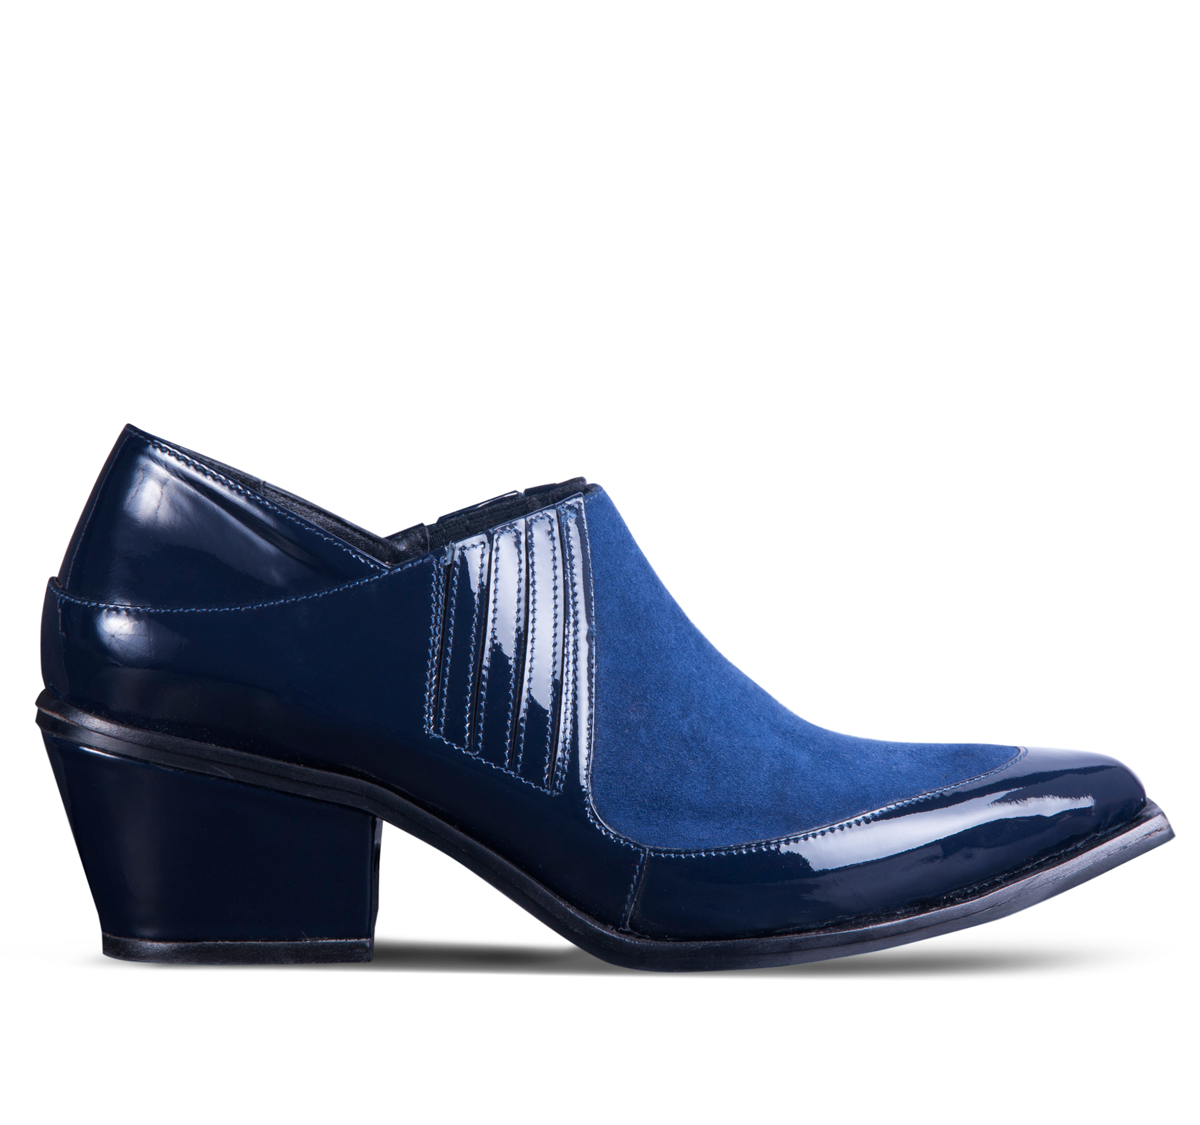 Modelo Rene azul. Foto: Telma.